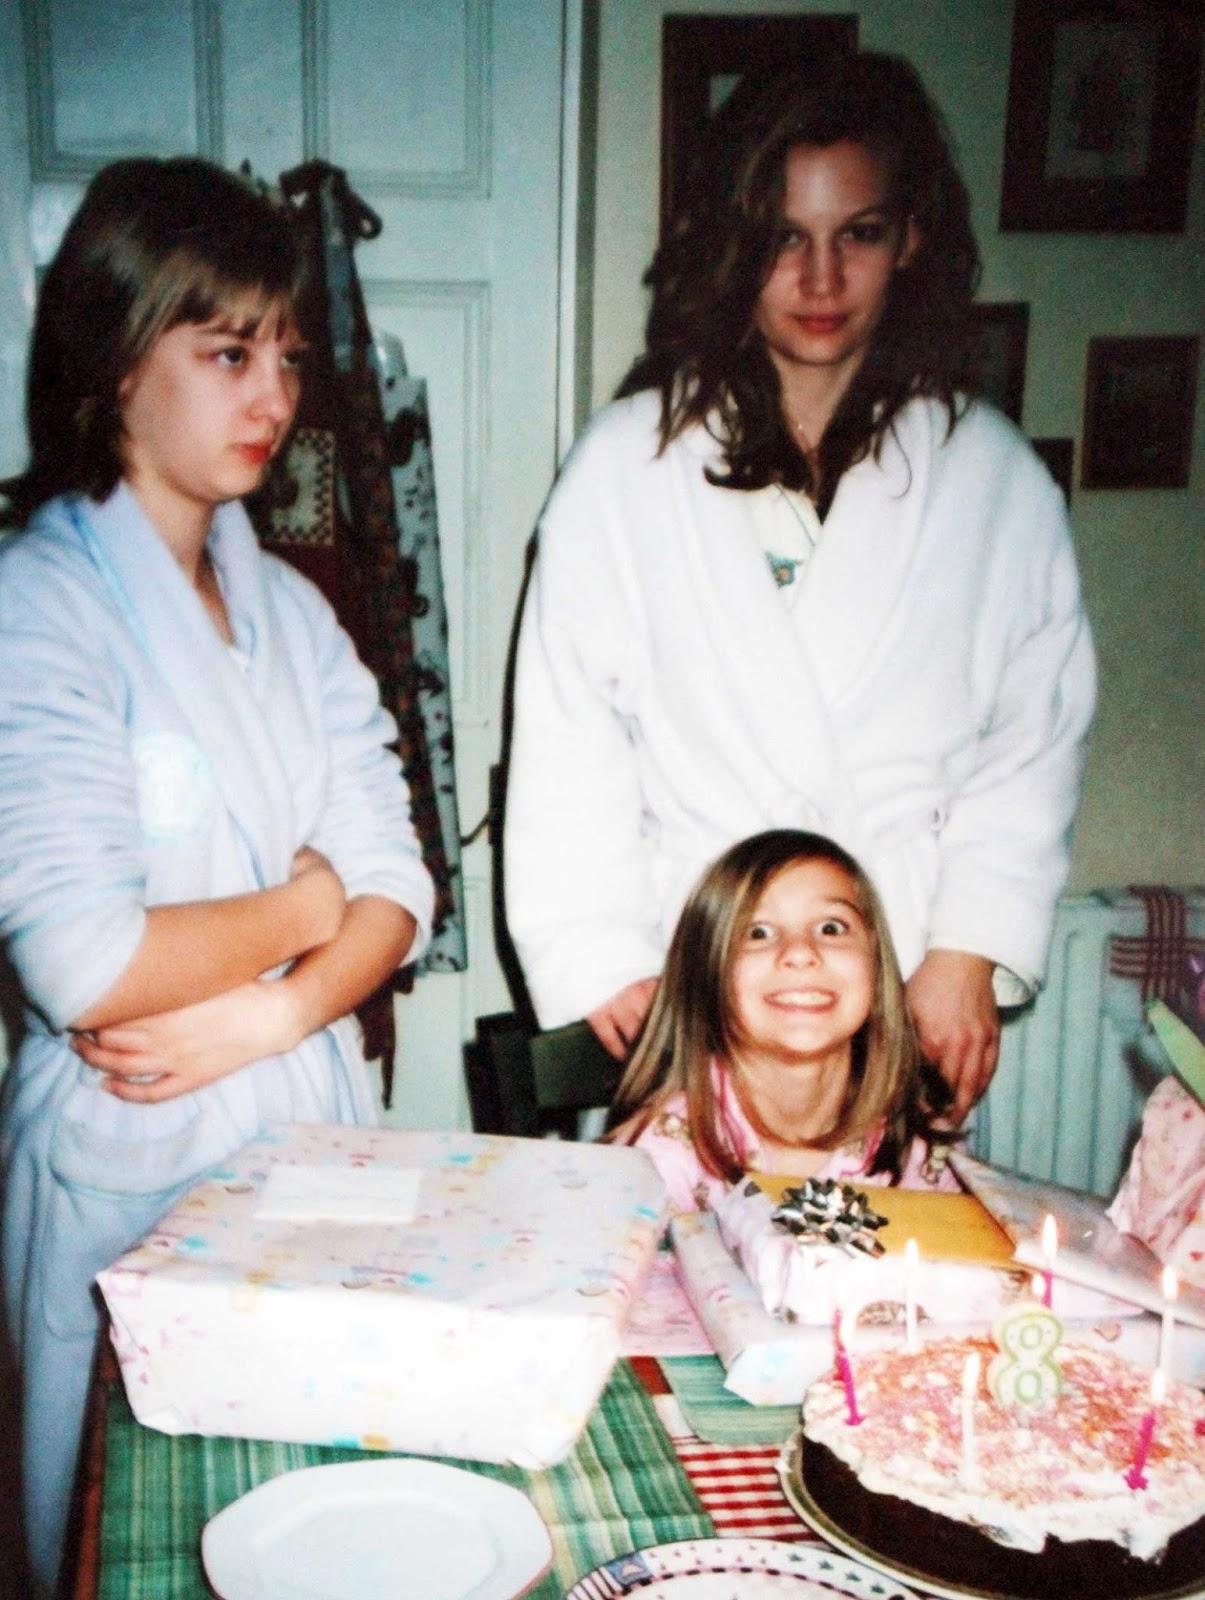 Throwback Thursday Sister Sister Anna Saccone Joly